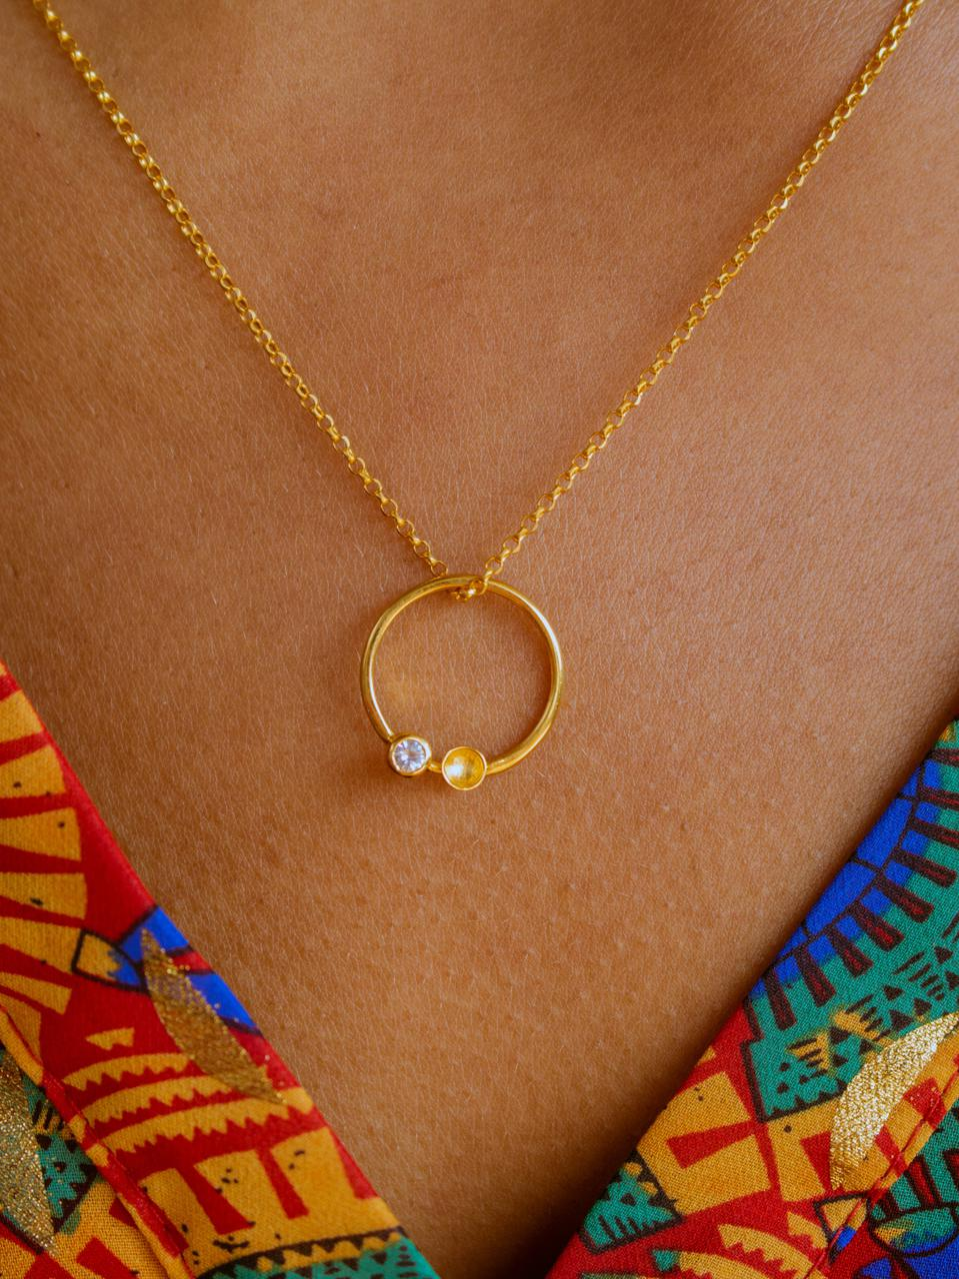 The Night Sky necklace by Kassandra Lauren Gordon, 22ct gold vermeil with white diamond cut sapphire stone